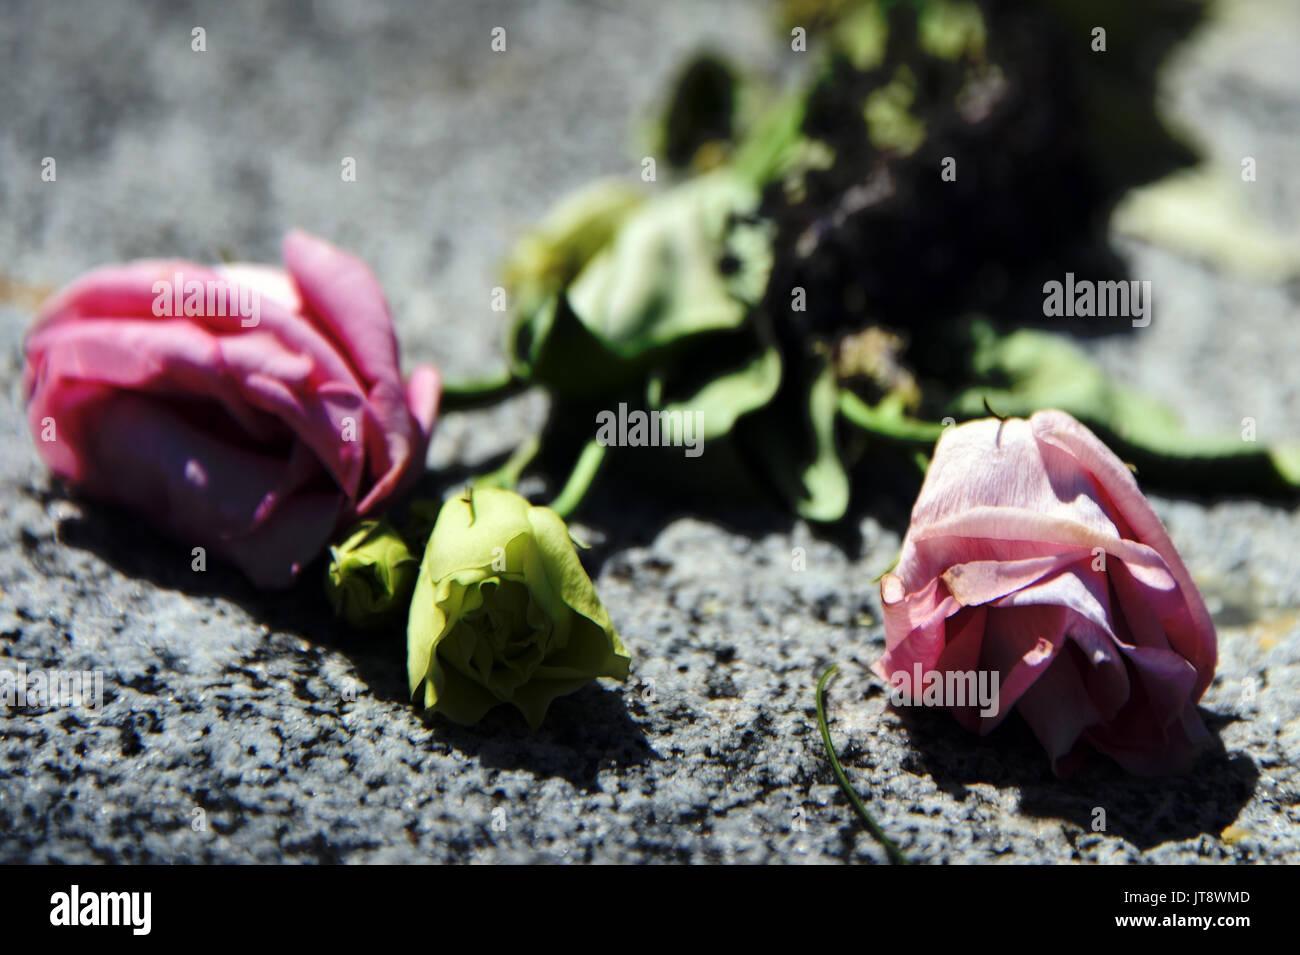 Dead Flowers - Stock Image